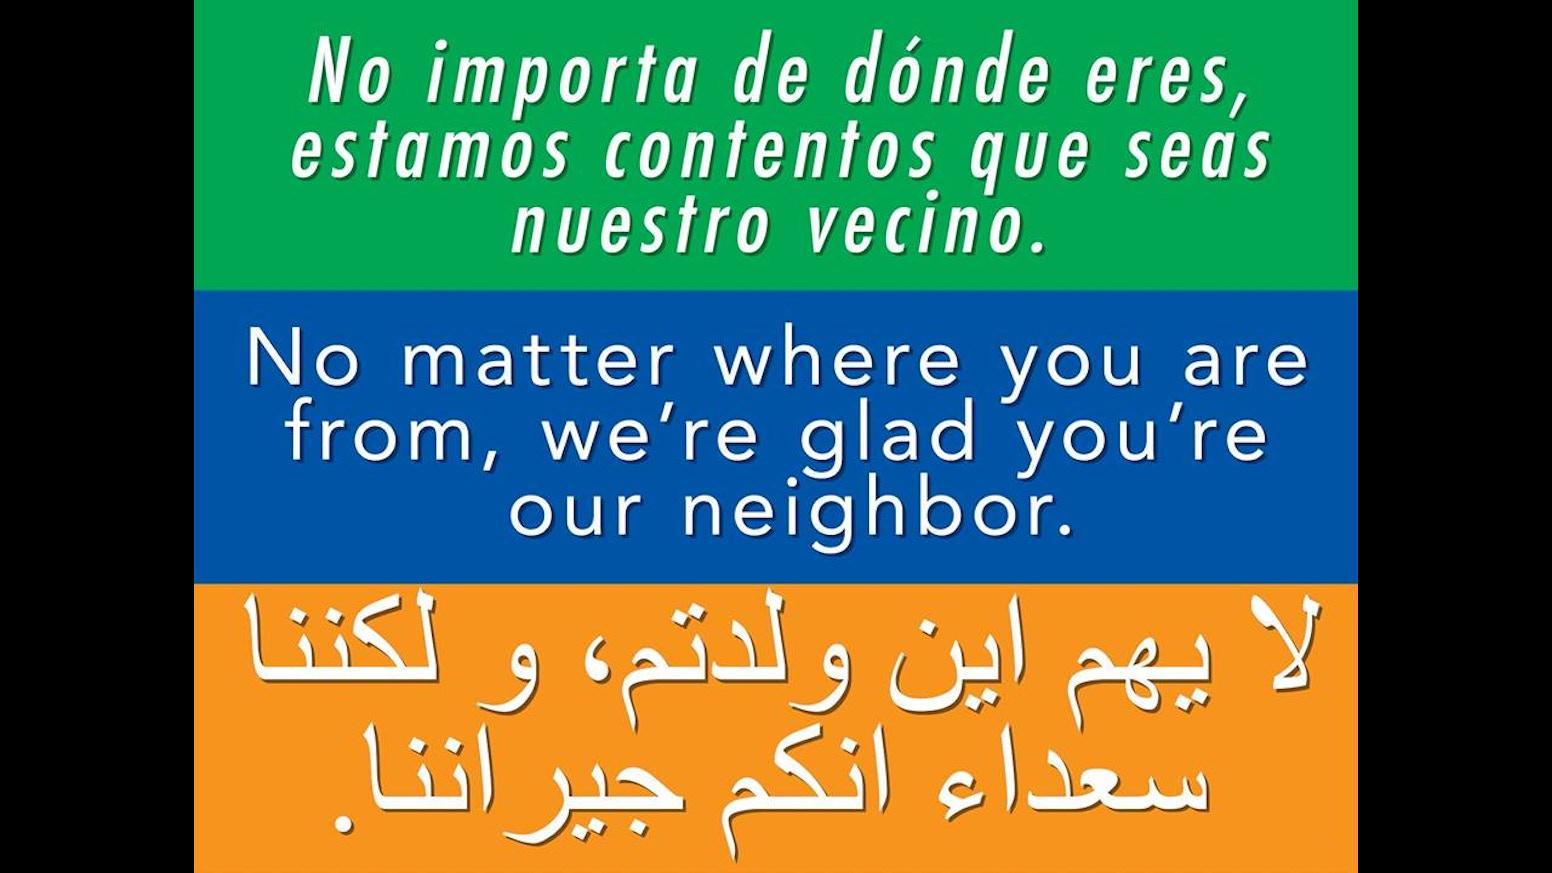 Bumper sticker creator canada - Welcome Your Neighbors Bumper Stickers